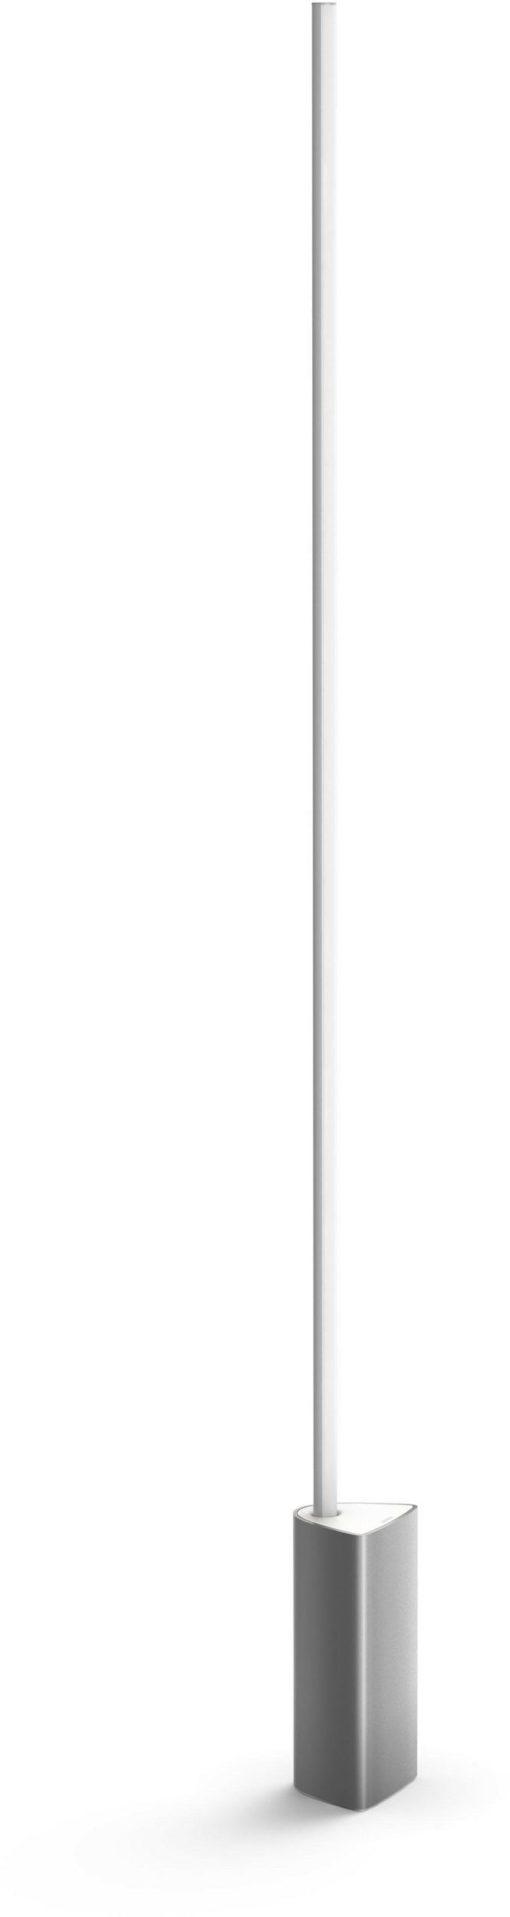 "Lampa podłogowa LED Philips Hue ""White & Col"""